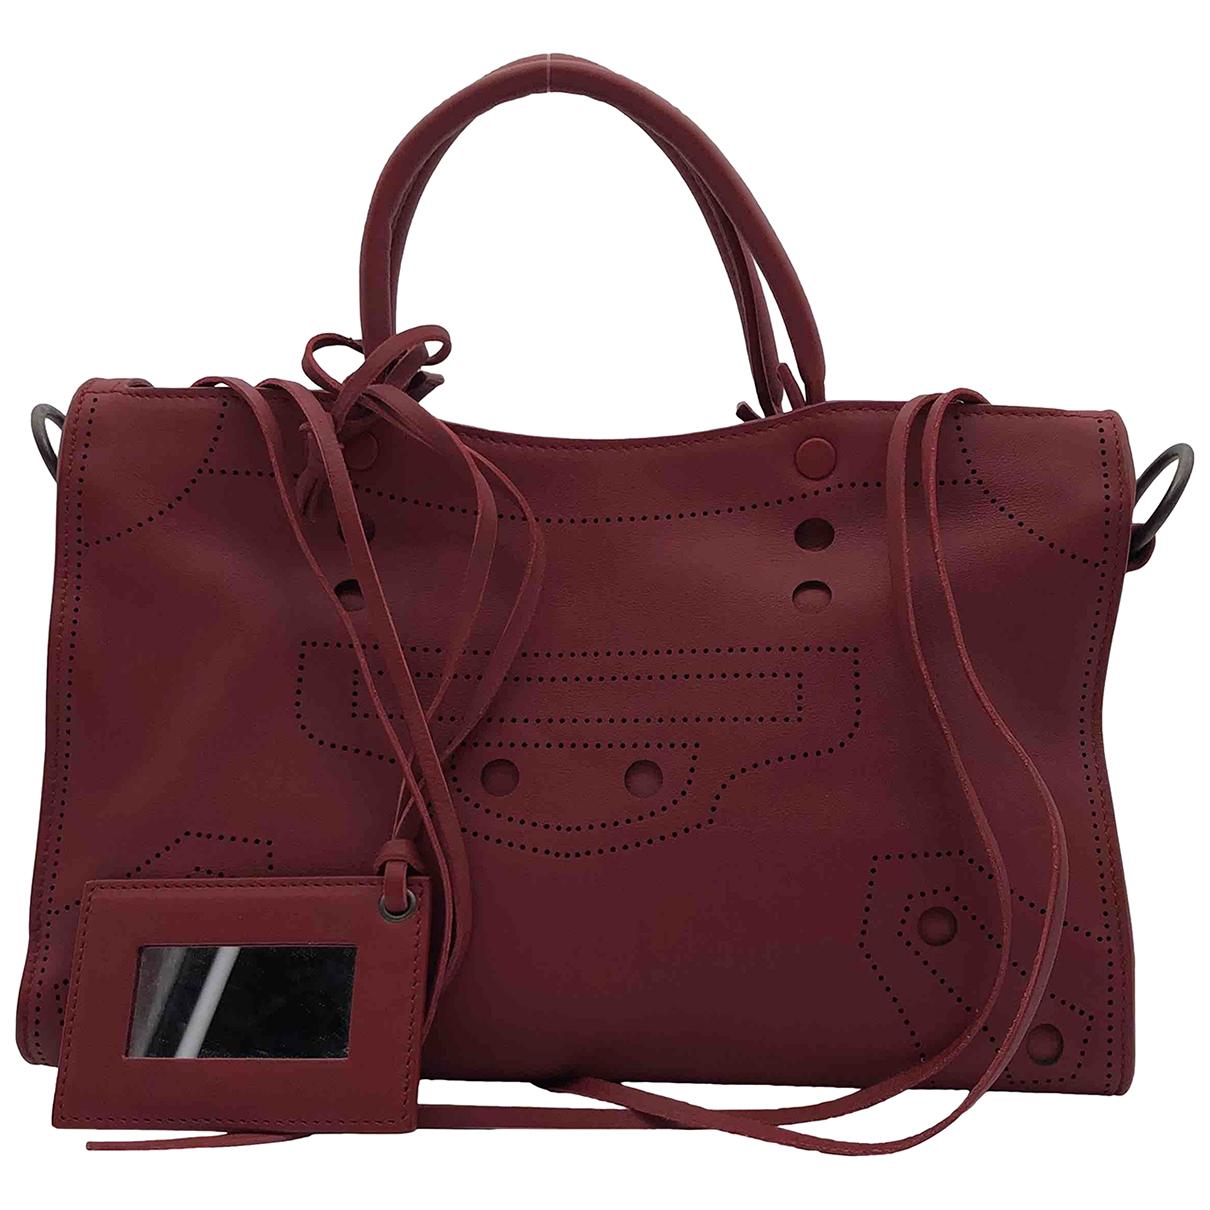 Balenciaga City Burgundy Leather handbag for Women N